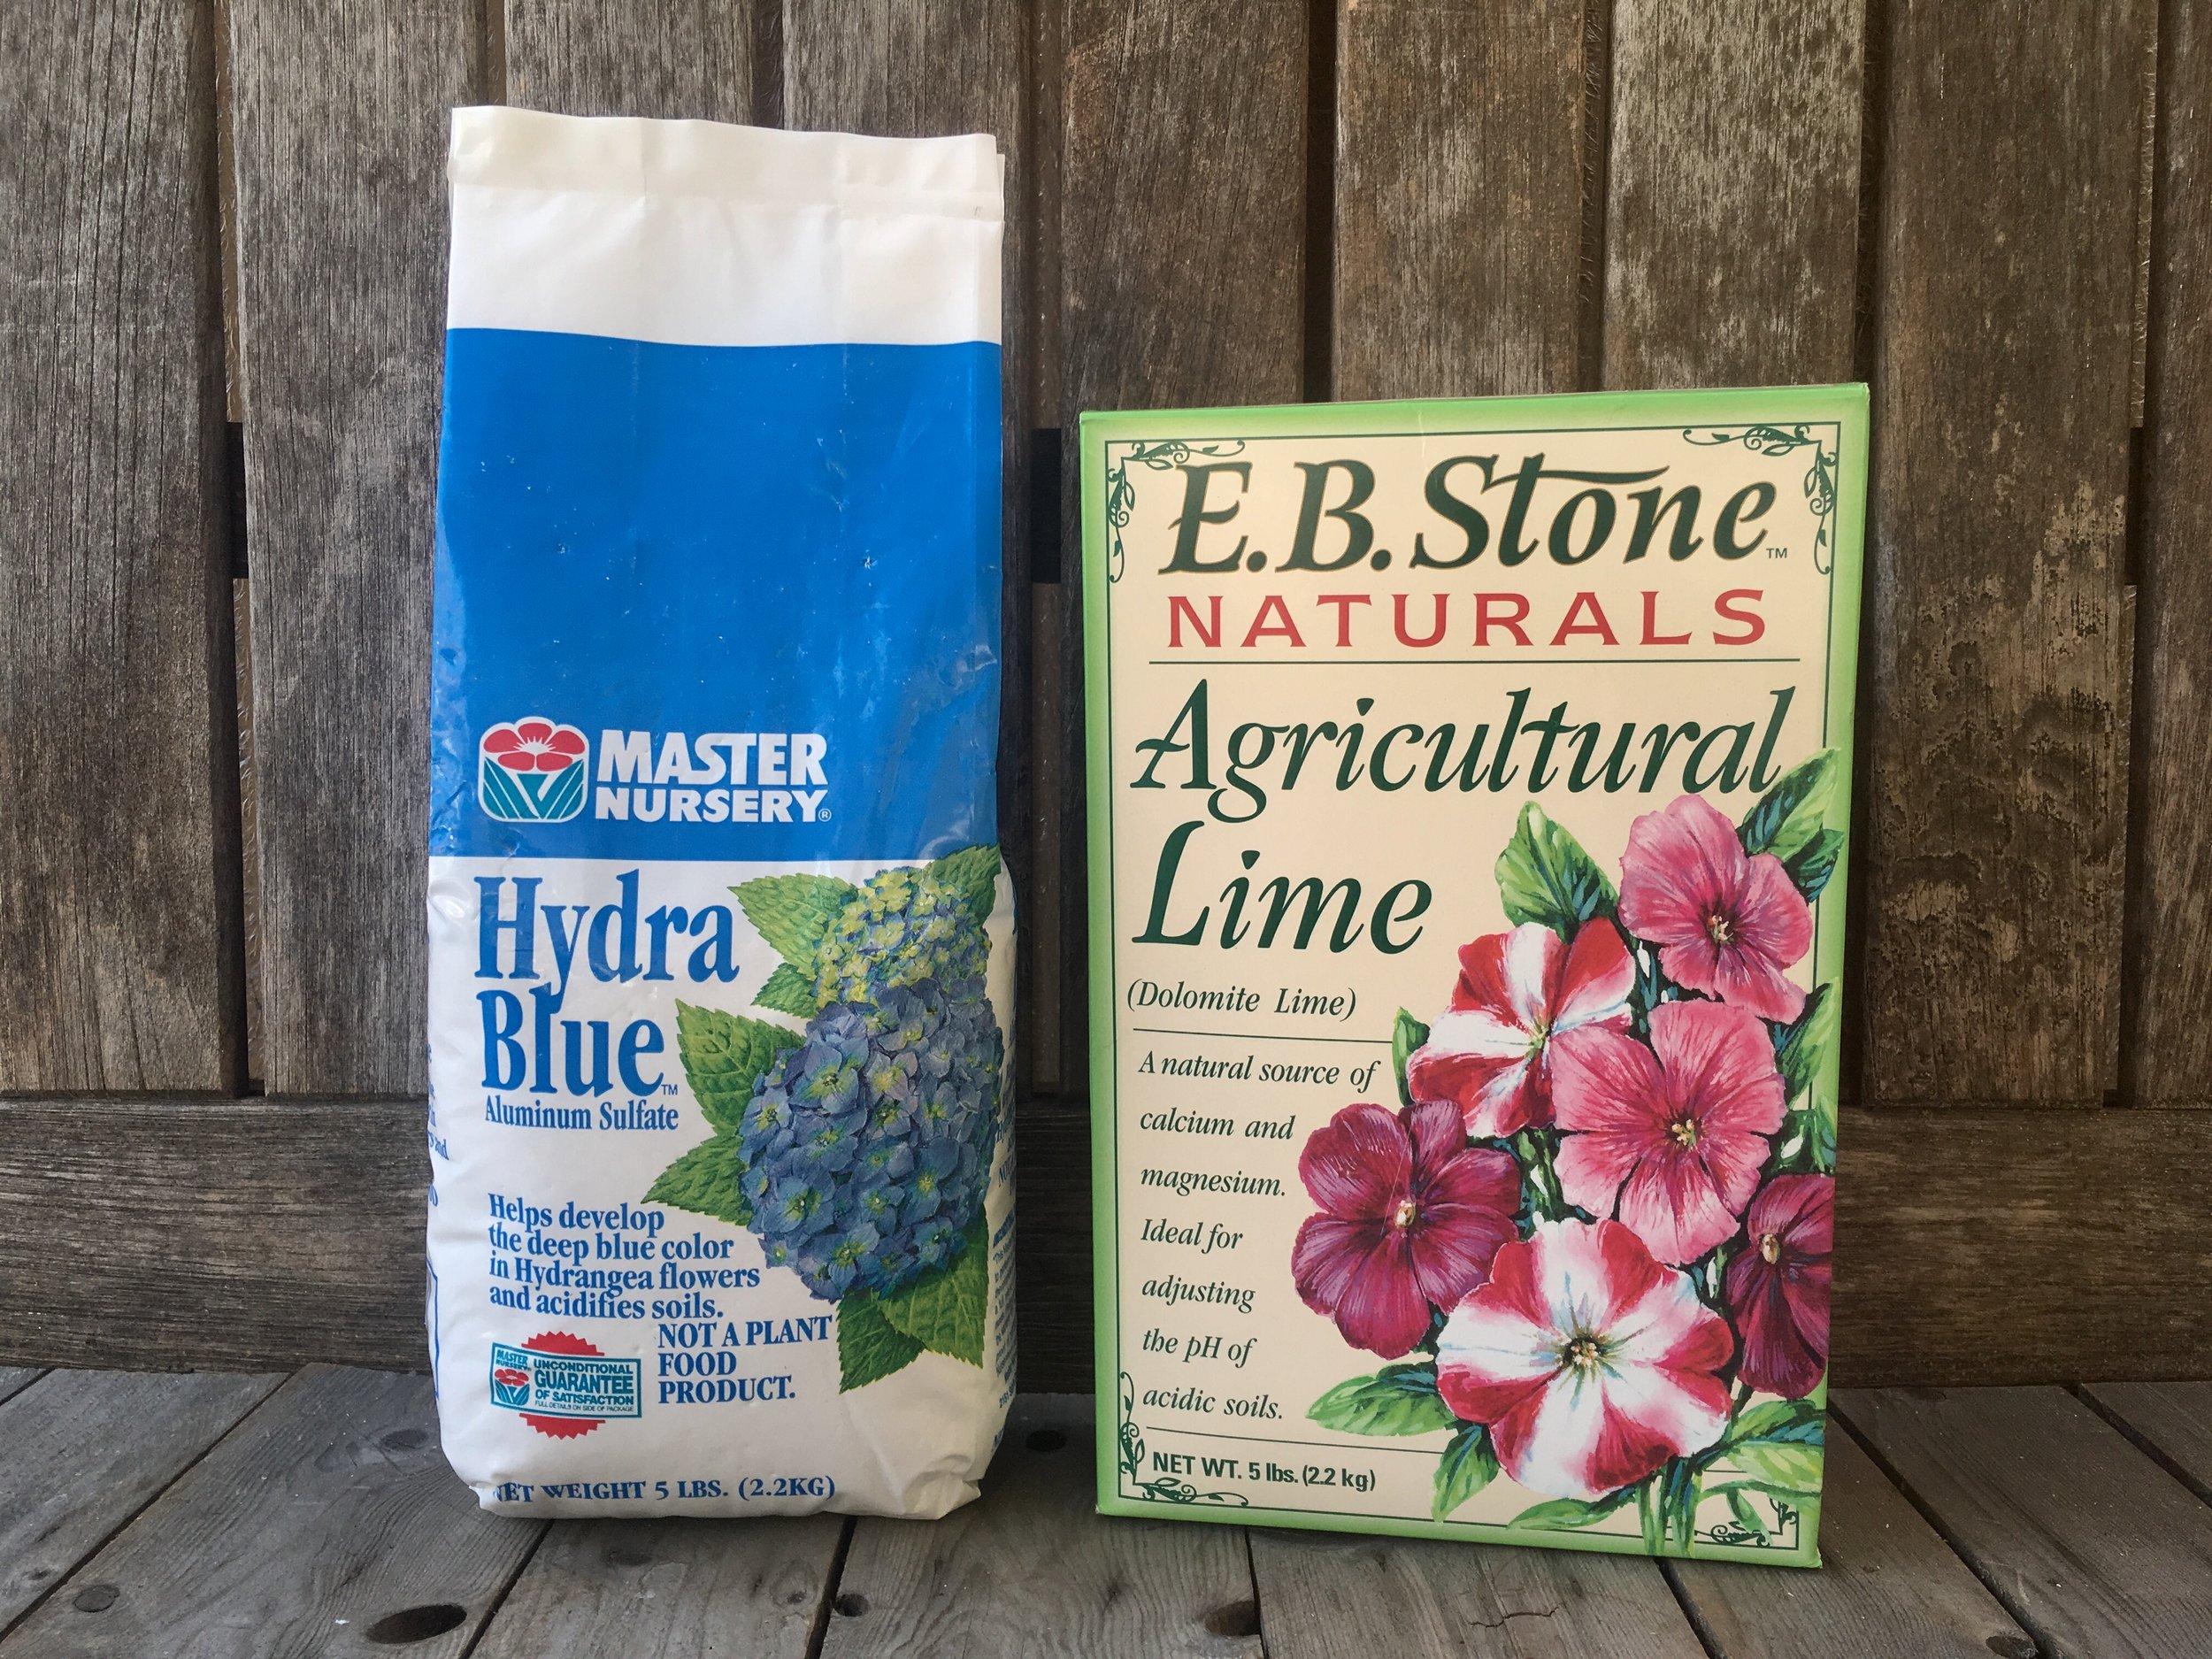 For blue hydrangeas add Hydra Blue, for pink add Dolomite Lime.